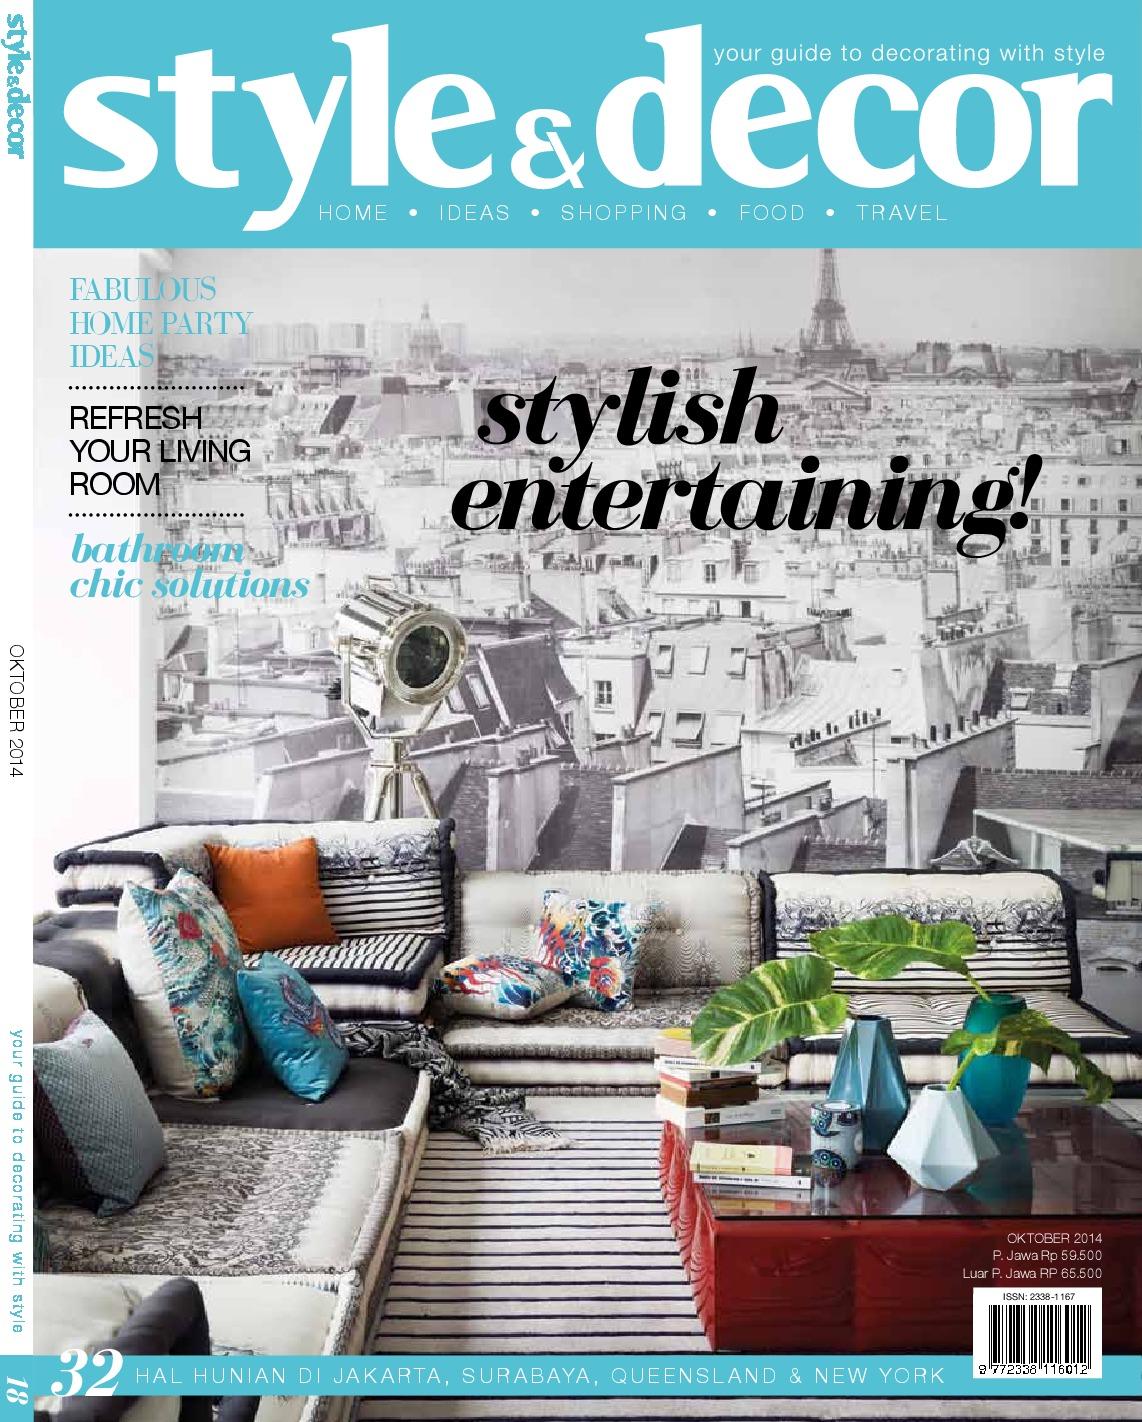 Indonesie_Style_INDONESIE_STYLE_INDONESIE_STYLE_INDONESIE_STYLE_&_DECOR_COUVERTURE_OCT_2014_DECOR_CO